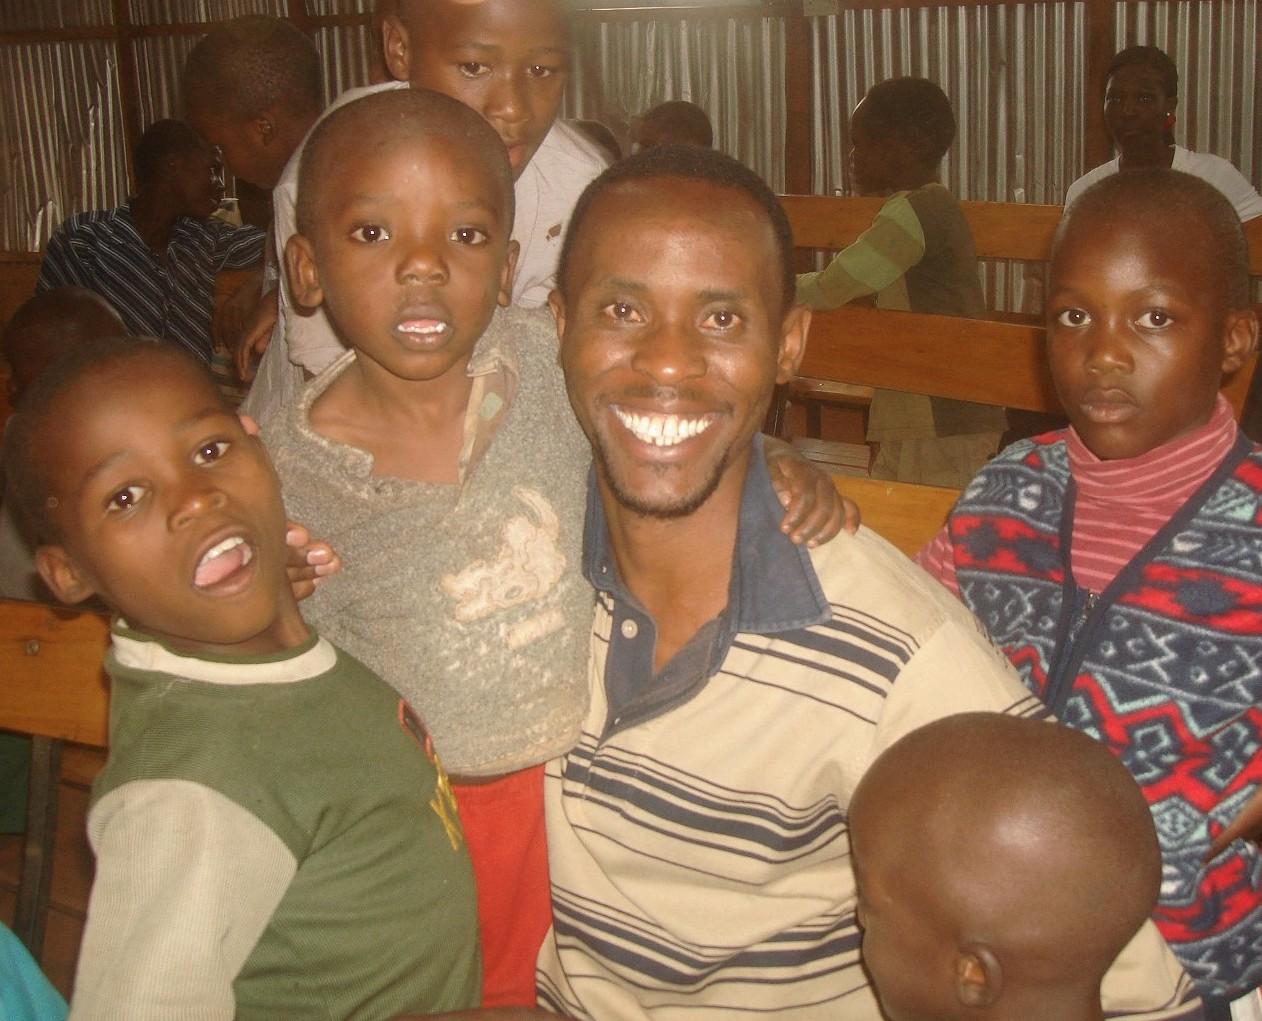 Sammy and children in the YCT Building Center